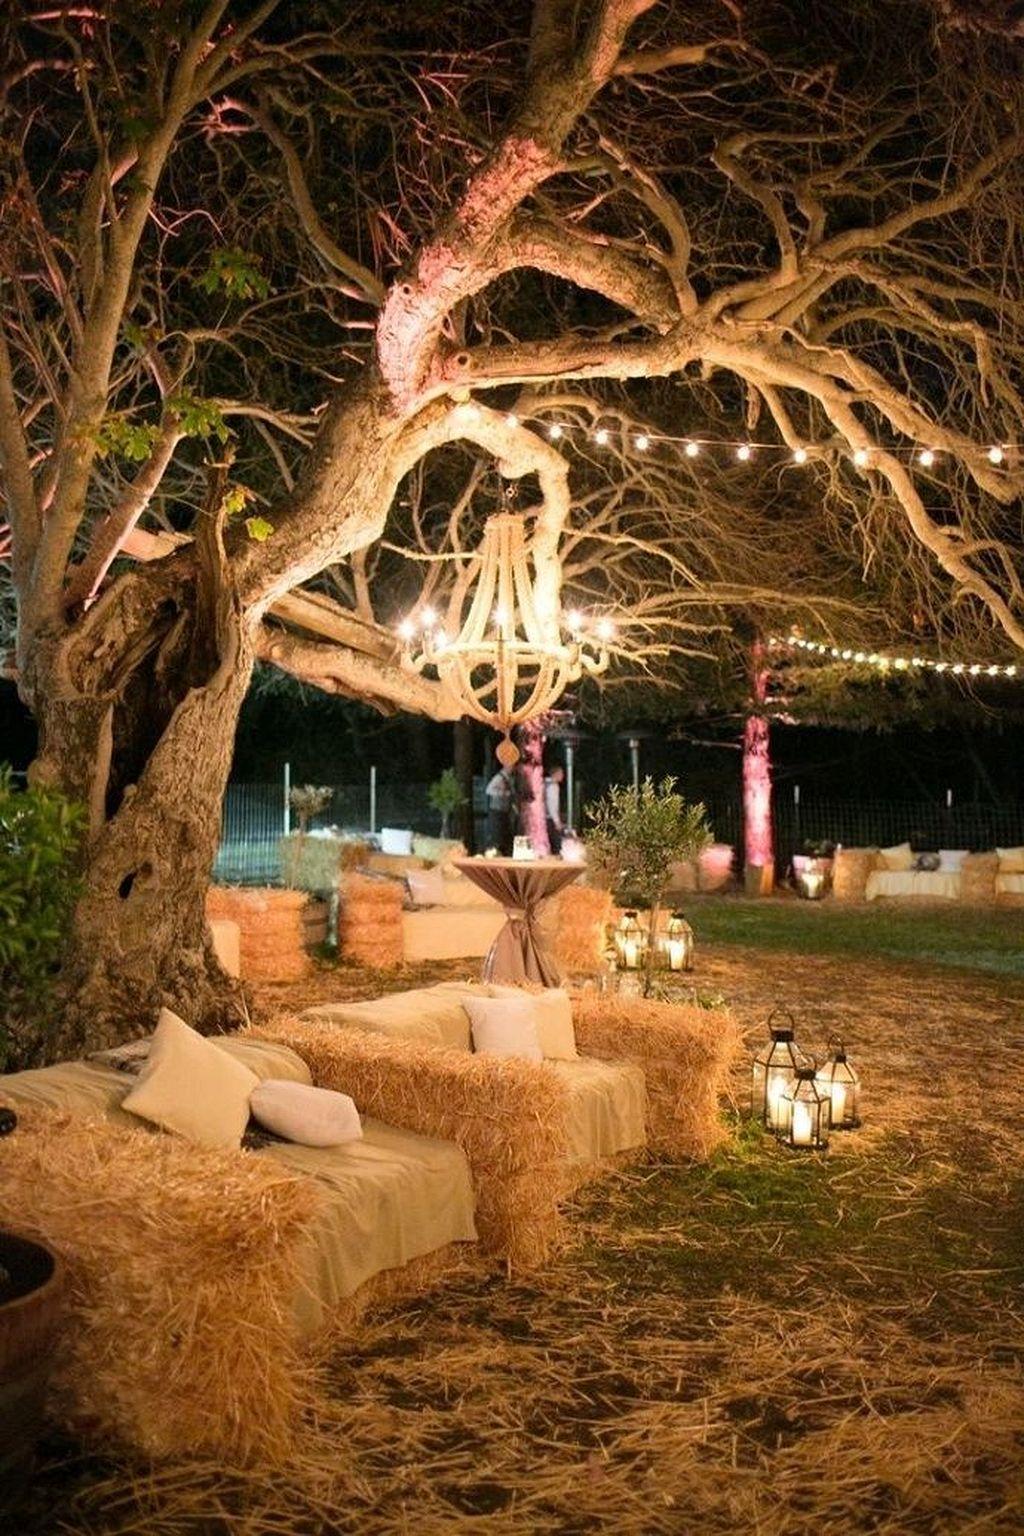 Fall outside wedding decoration ideas   Night Wedding Reception Decor Ideas  Reception Weddings and